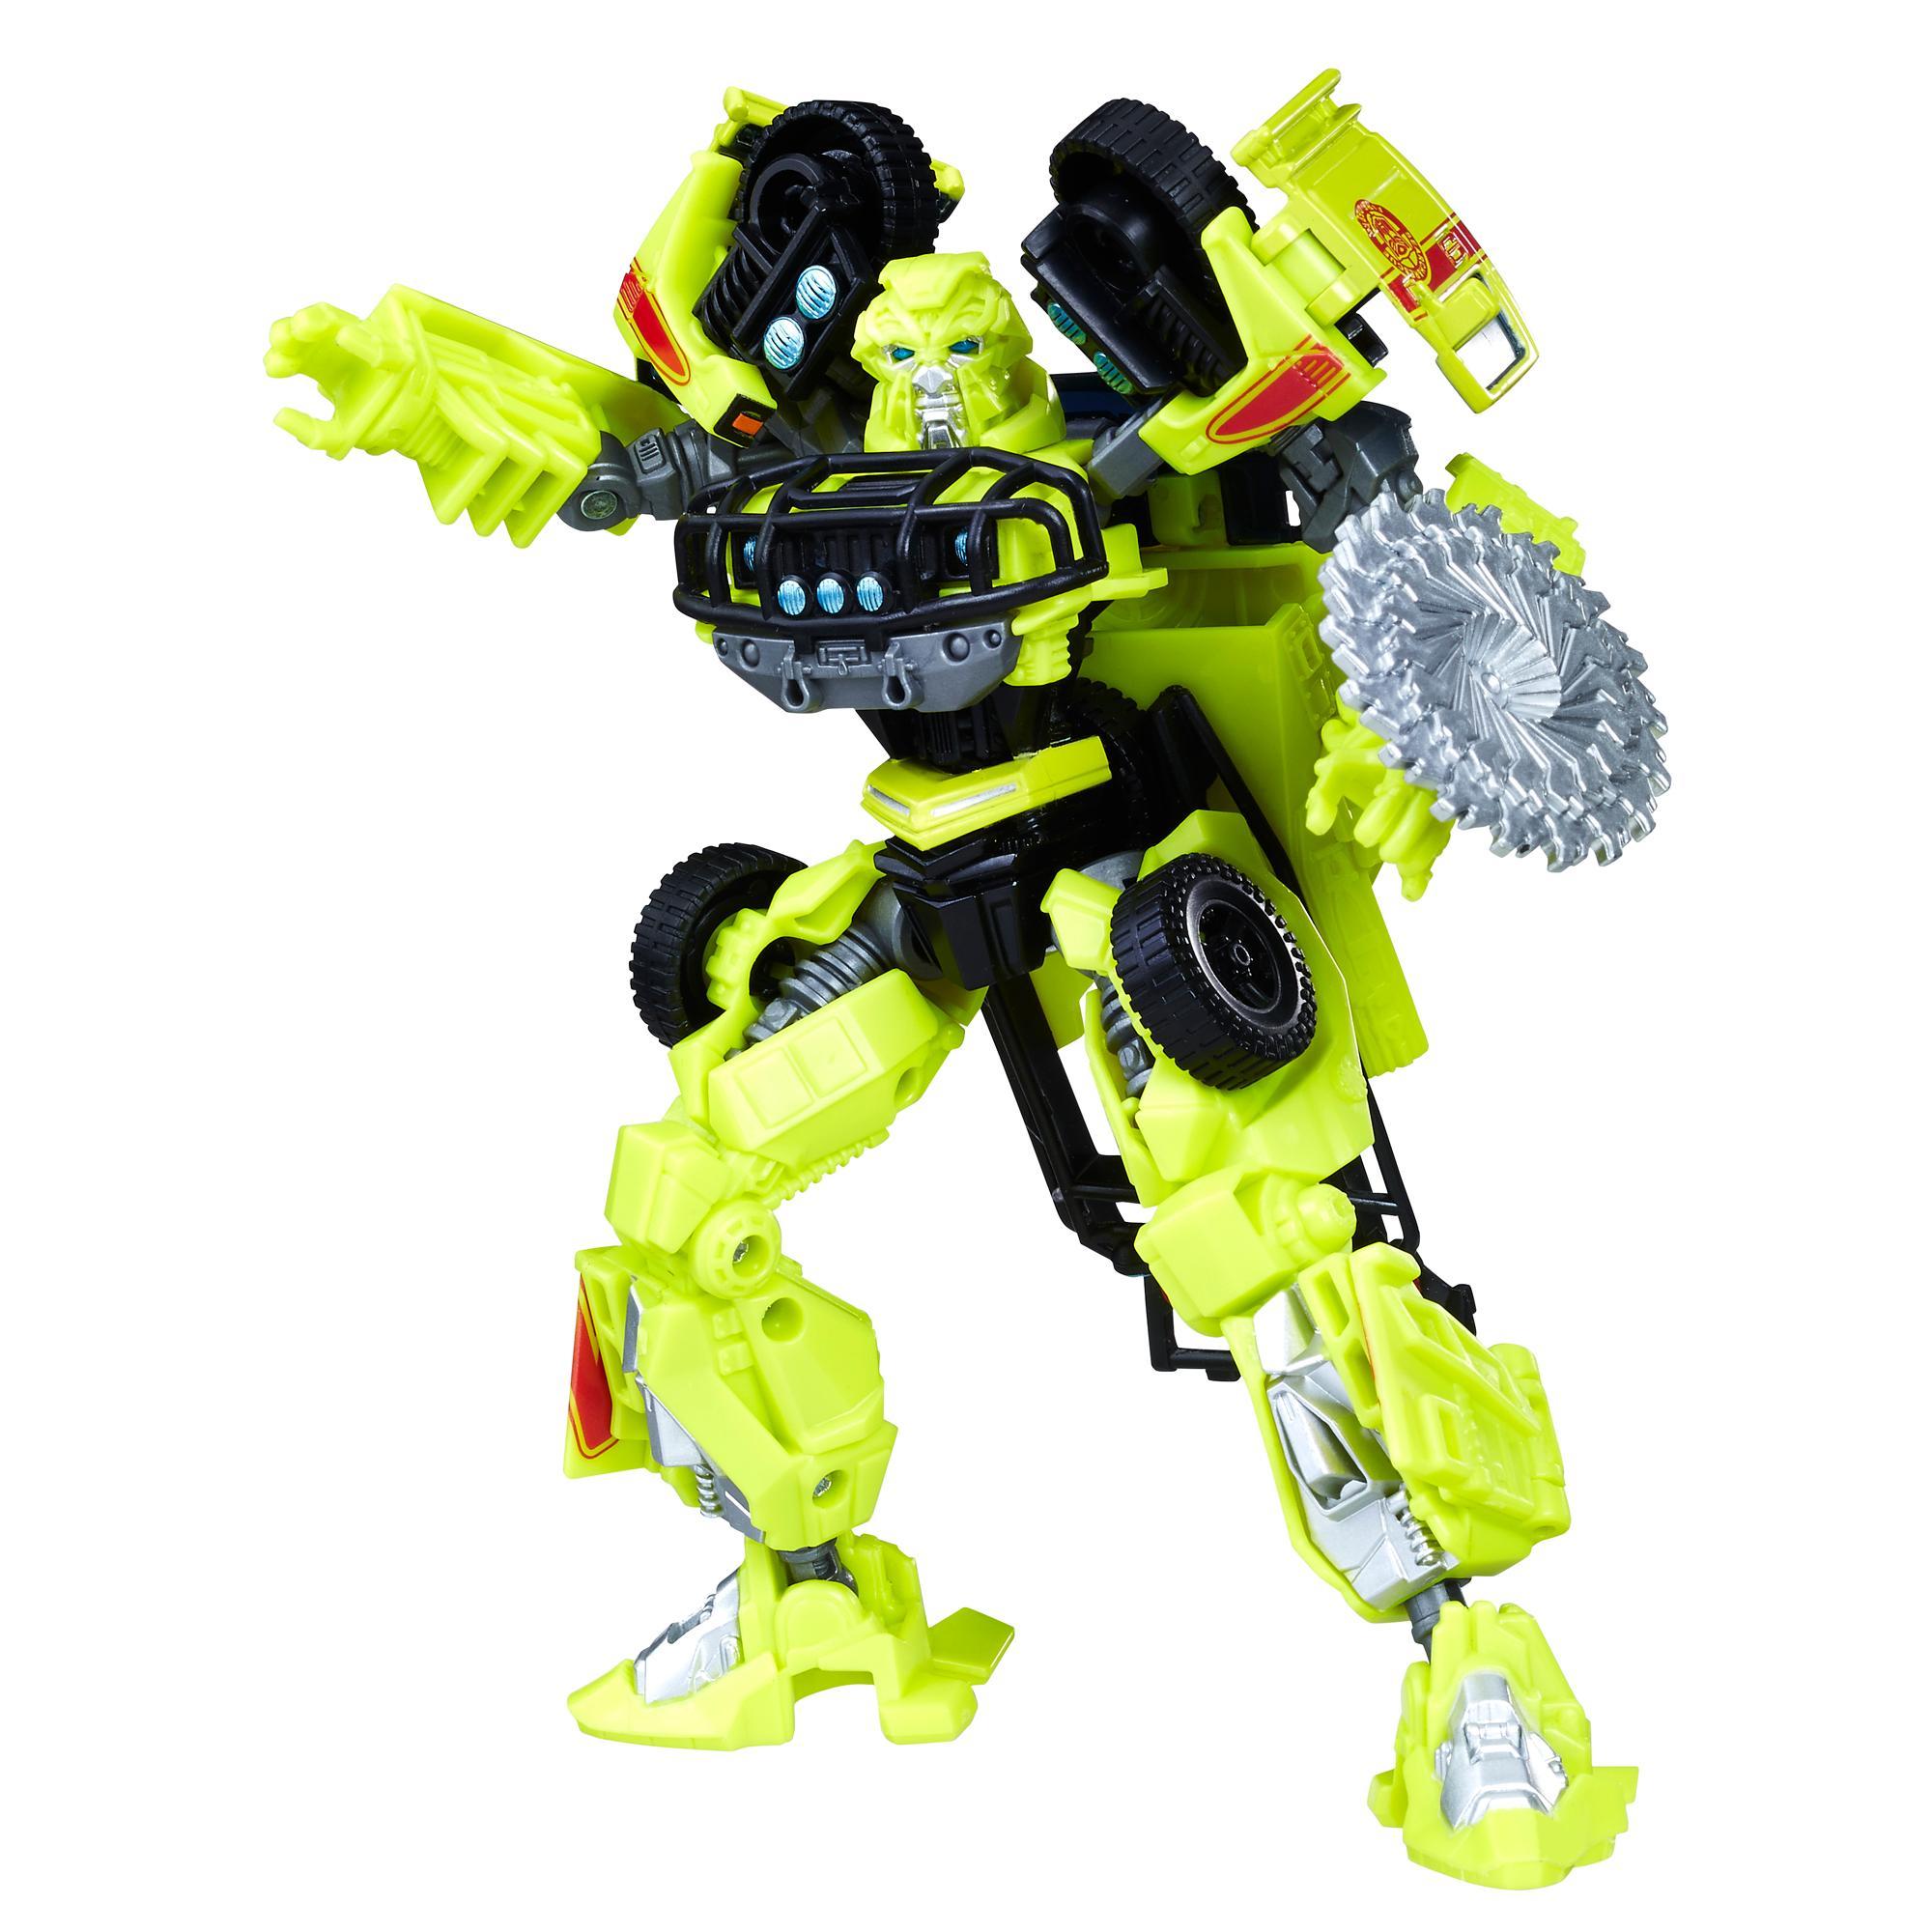 Transformers Studio Series 04 Deluxe Class Movie 1 Autobot Ratchet